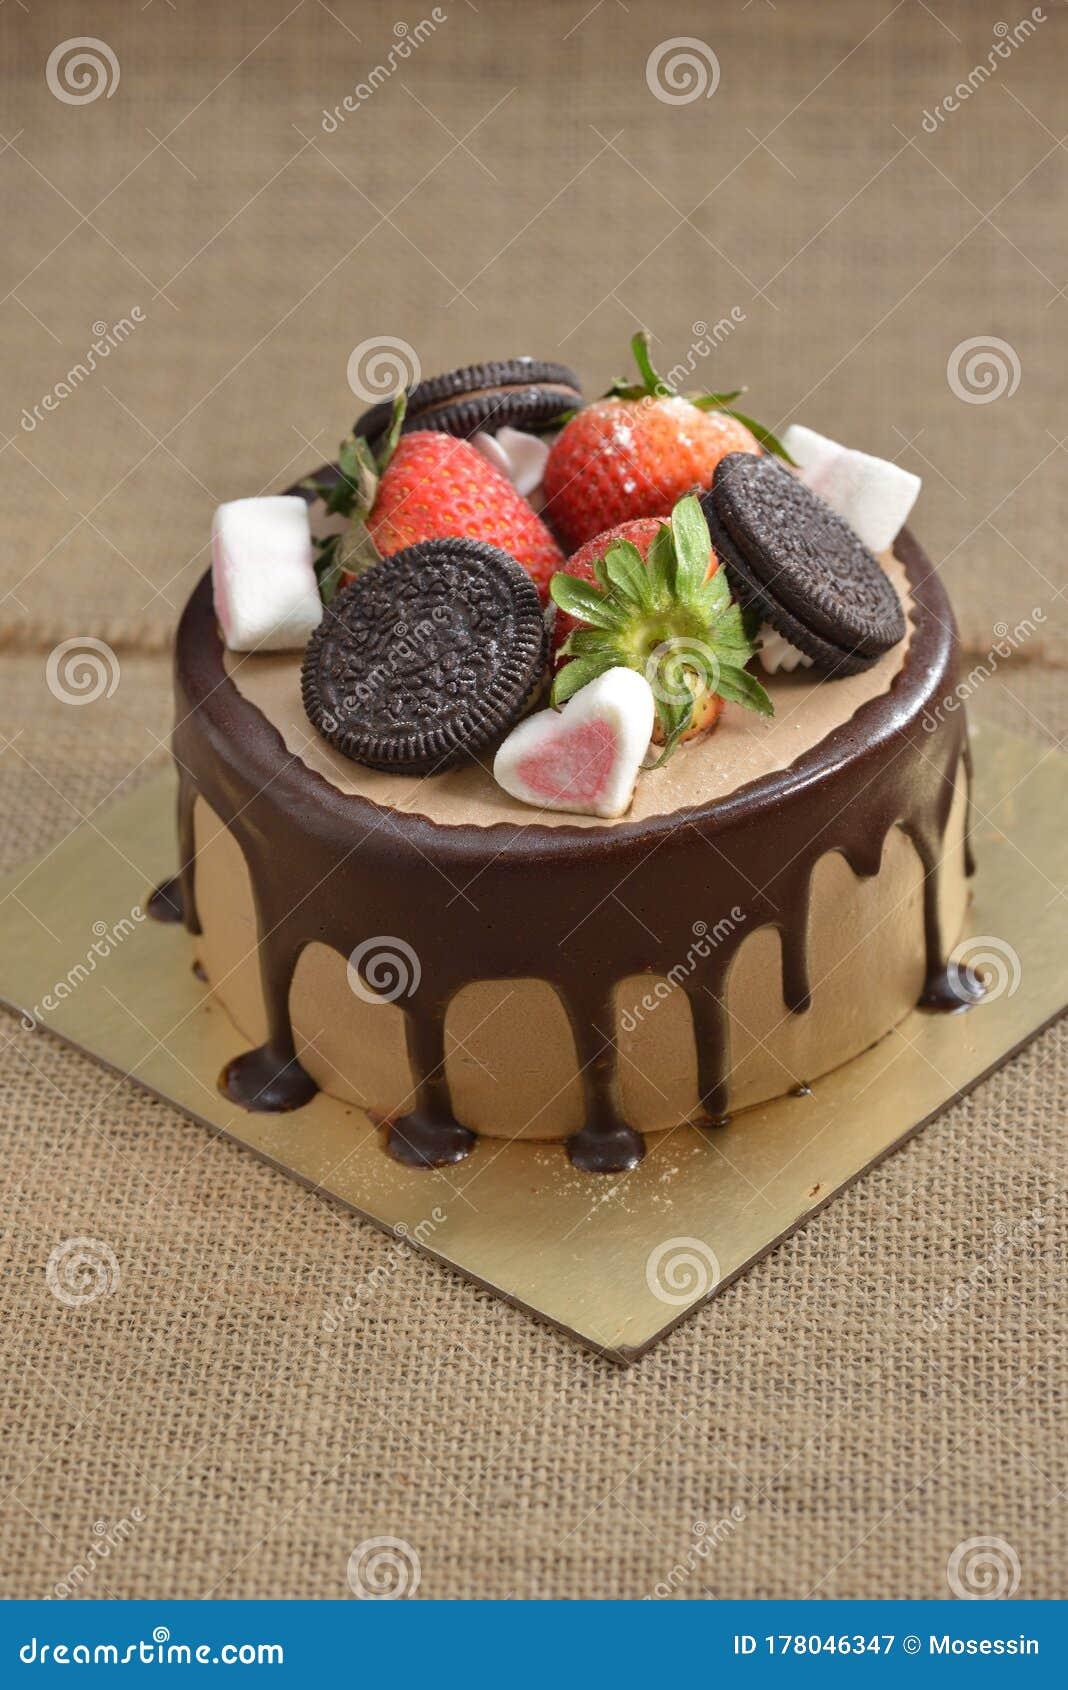 Swell Chocolate Strawberry Birthday Cake Strawberry Stock Image Image Funny Birthday Cards Online Barepcheapnameinfo